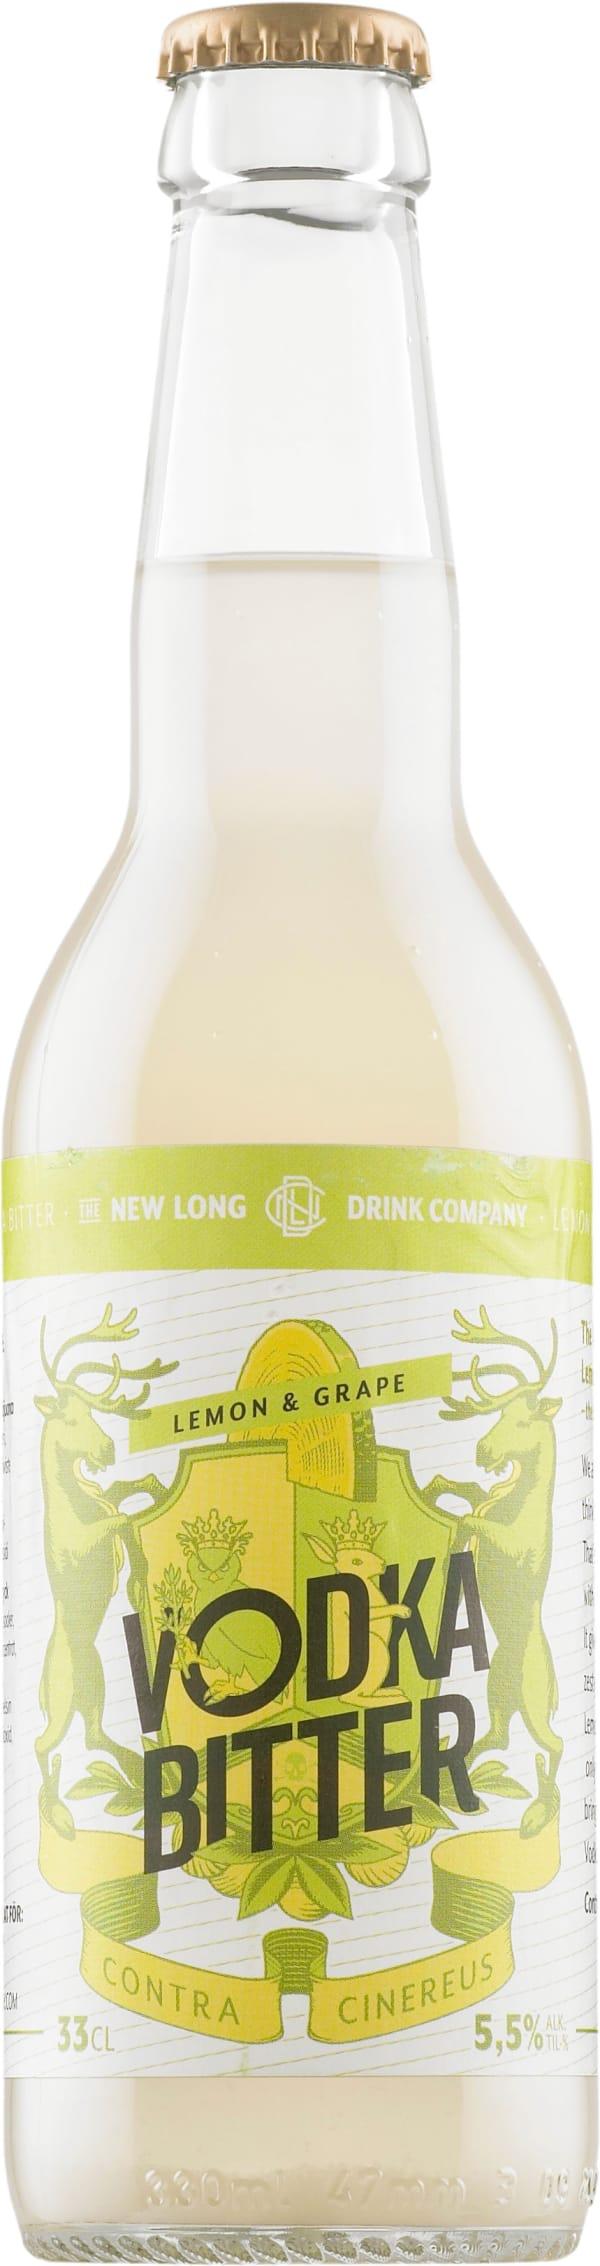 New Long Drink Company Lemon & Grape Vodka Bitter